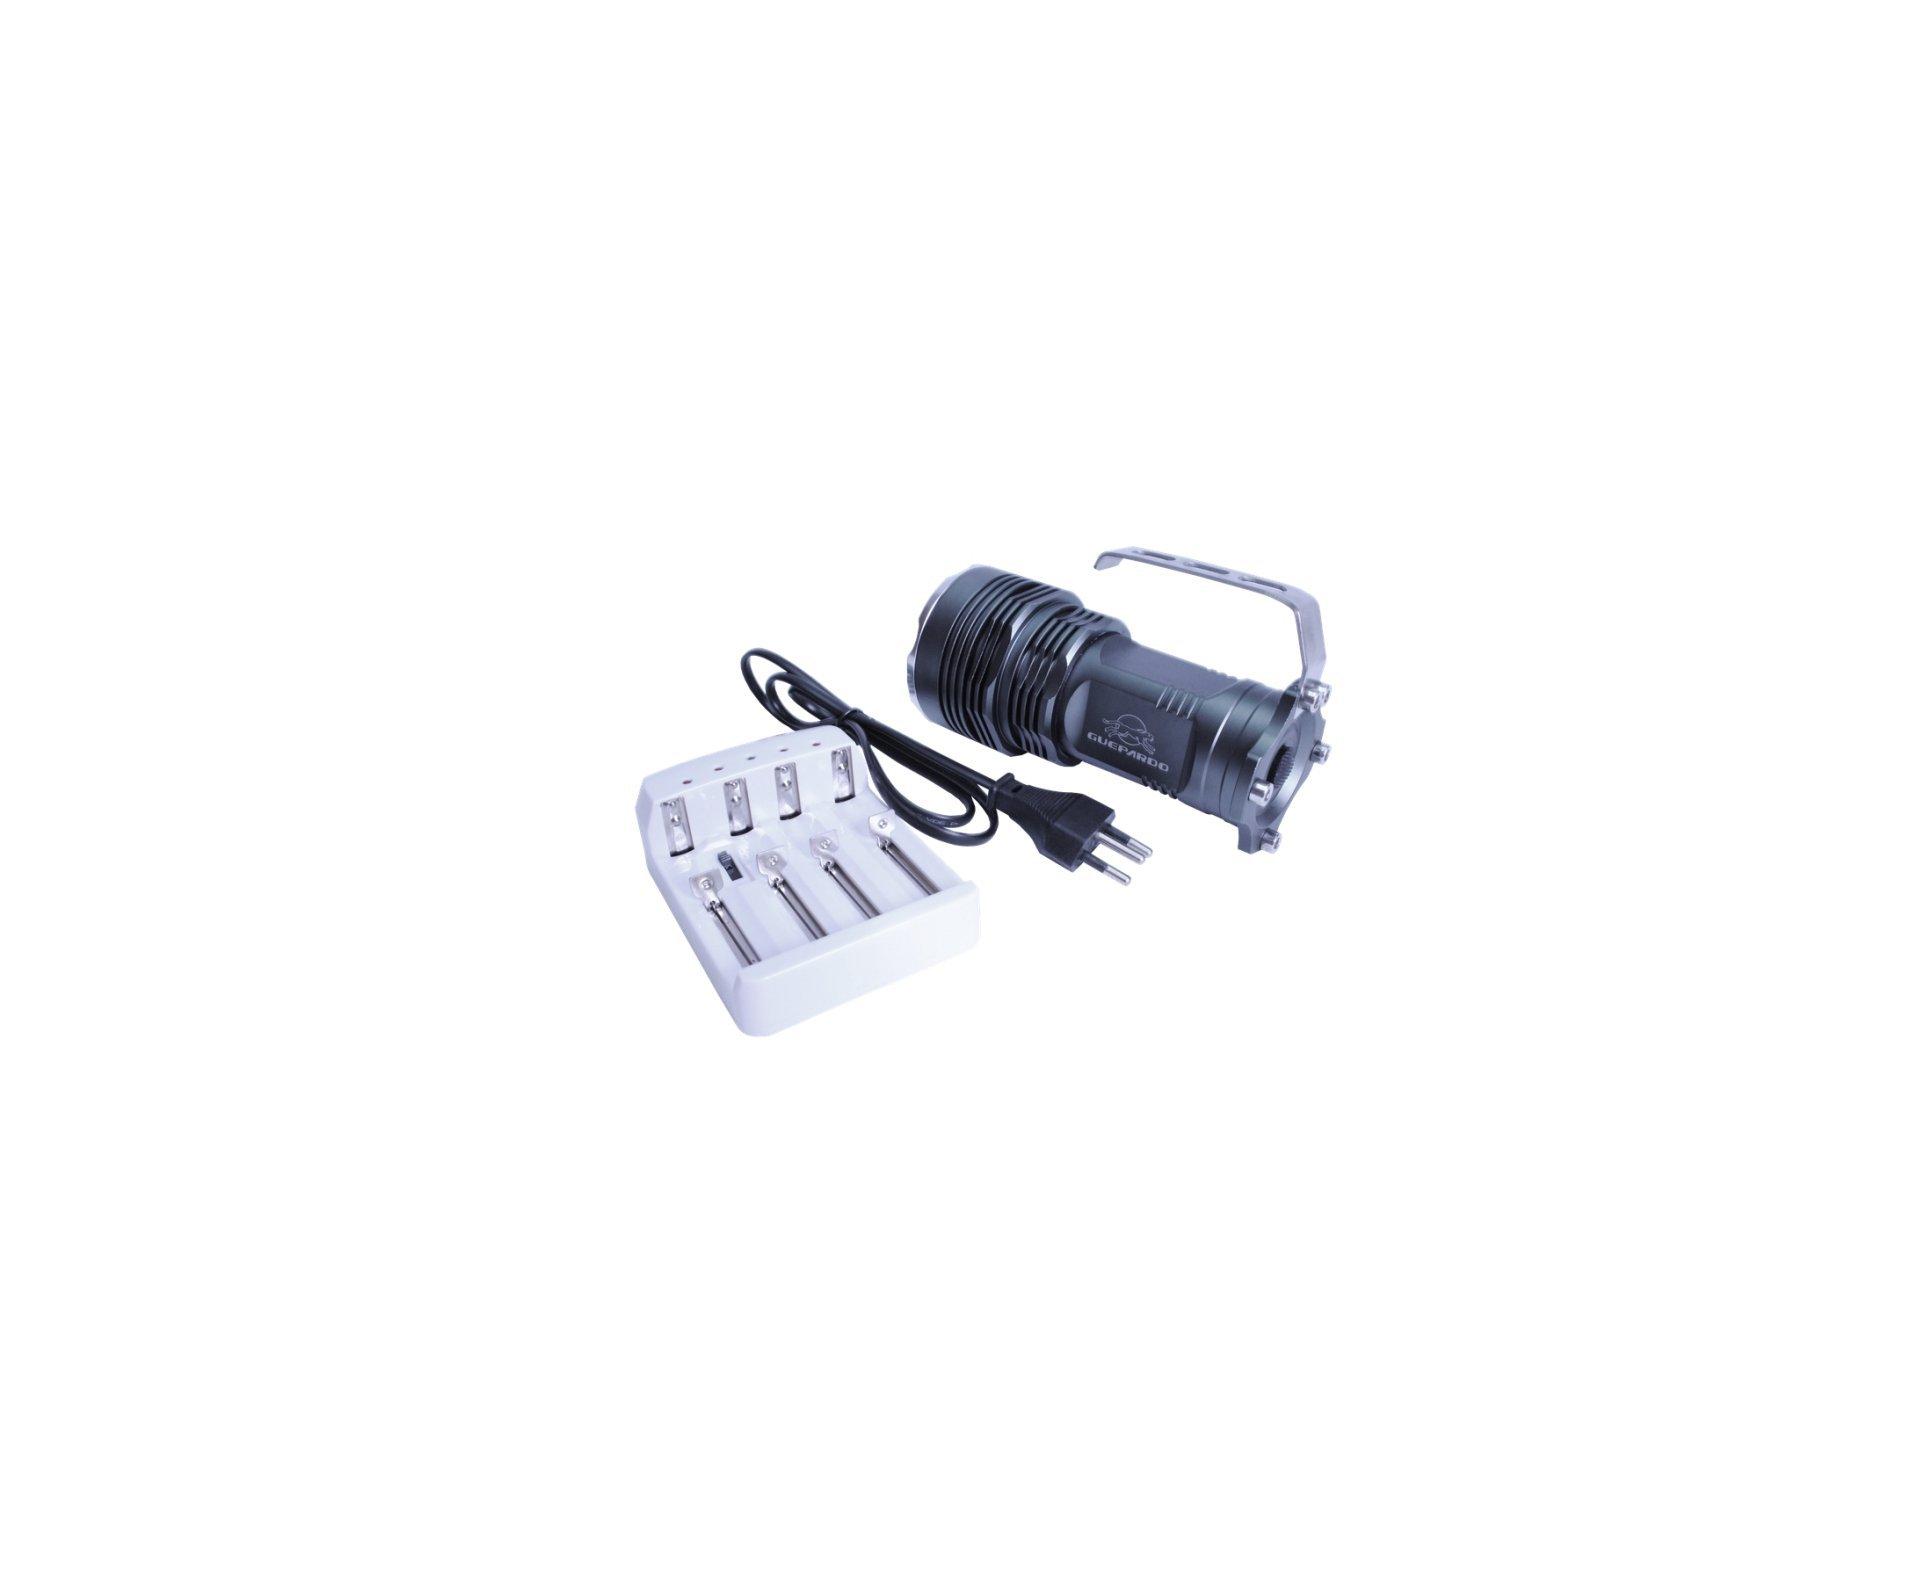 Holofote Tático T6 1000 Lumens - Guepardo